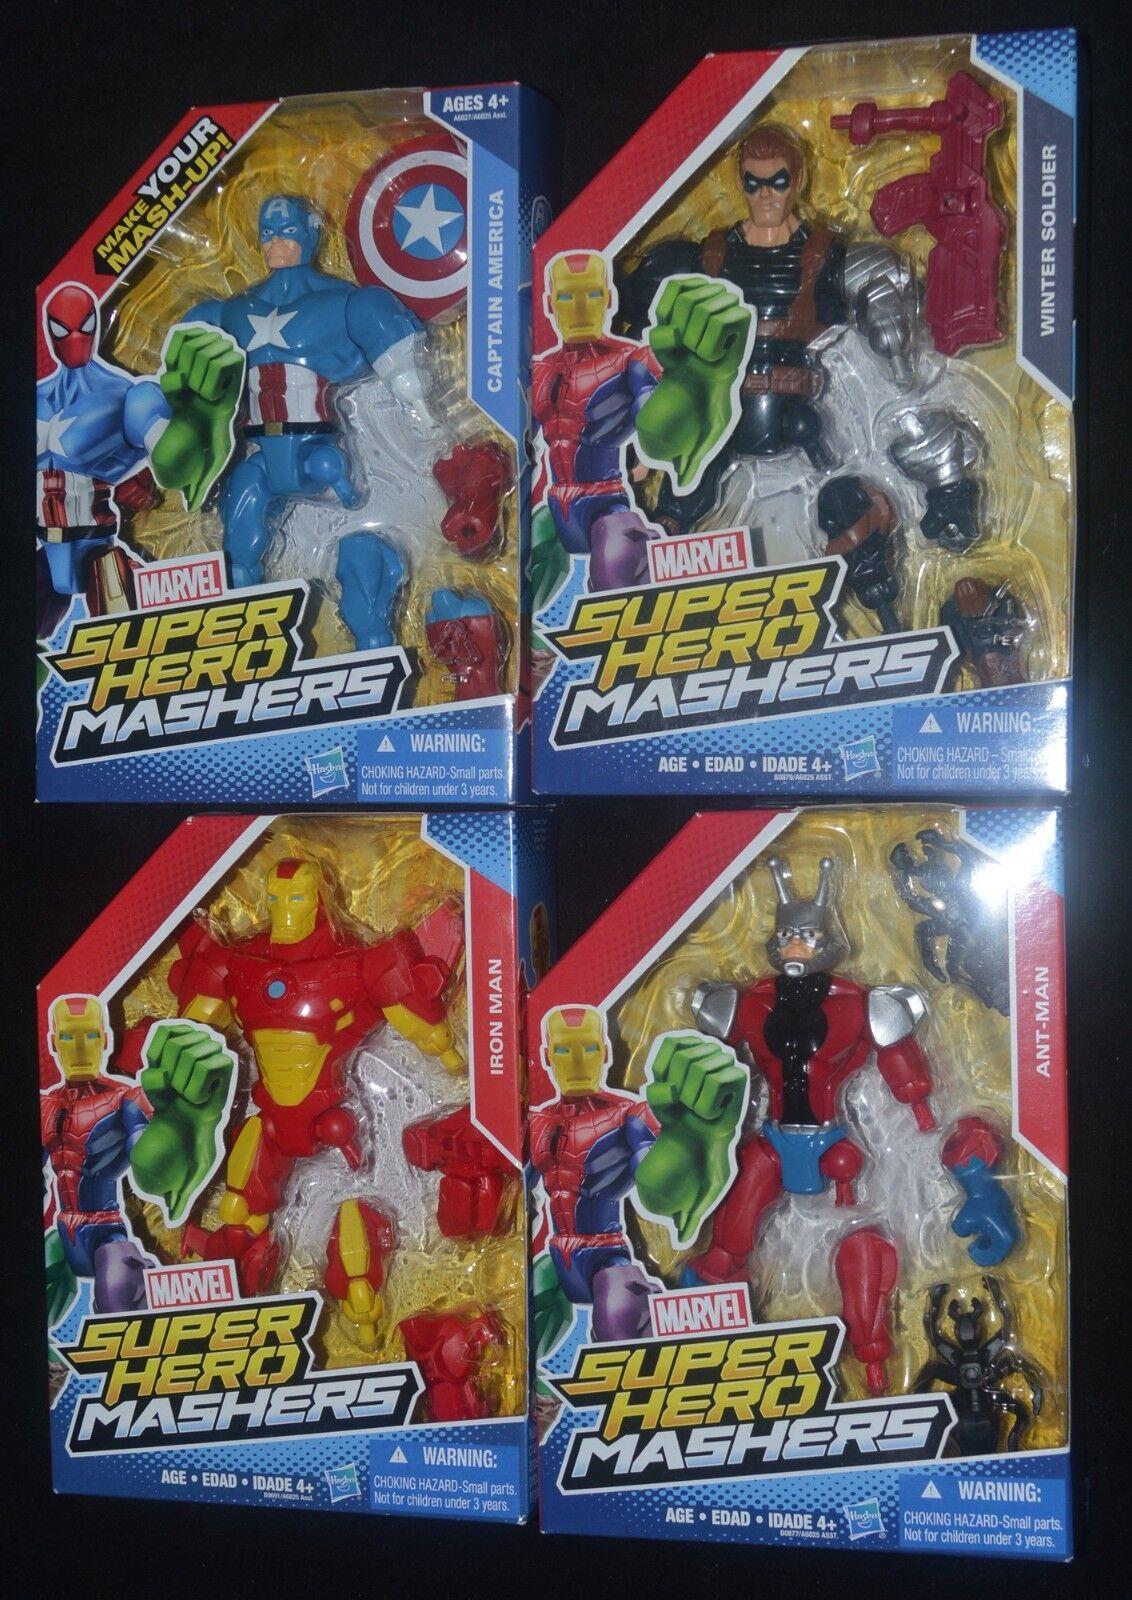 Marvel Super Hero Mashers CAPTAIN AMERICA, WINTER SOLDIER, IRON MAN & ANT-MAN